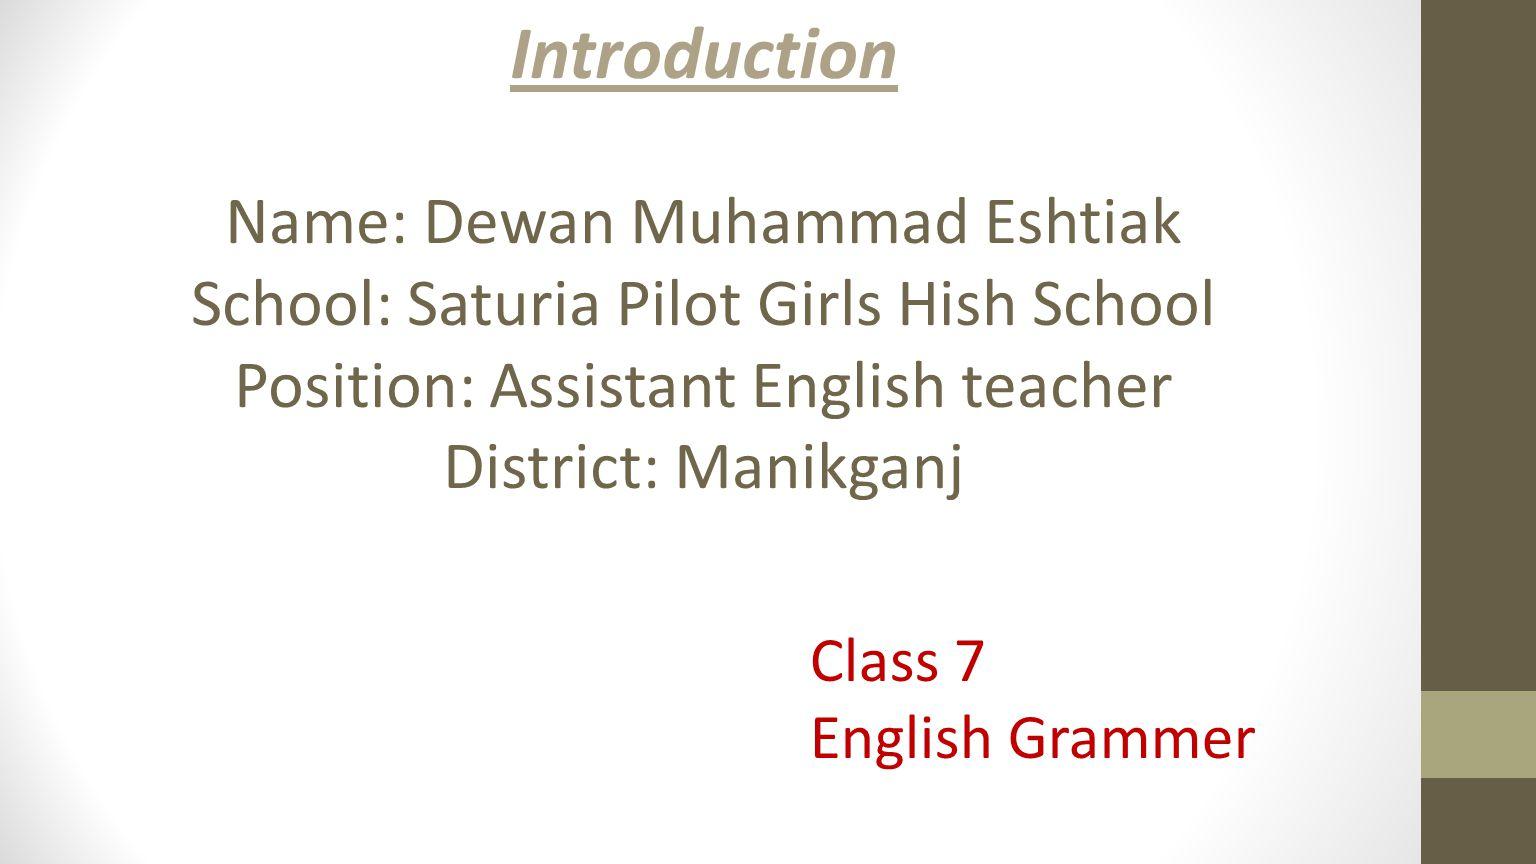 Introduction Name: Dewan Muhammad Eshtiak School: Saturia Pilot Girls Hish School Position: Assistant English teacher District: Manikganj Class 7 English Grammer